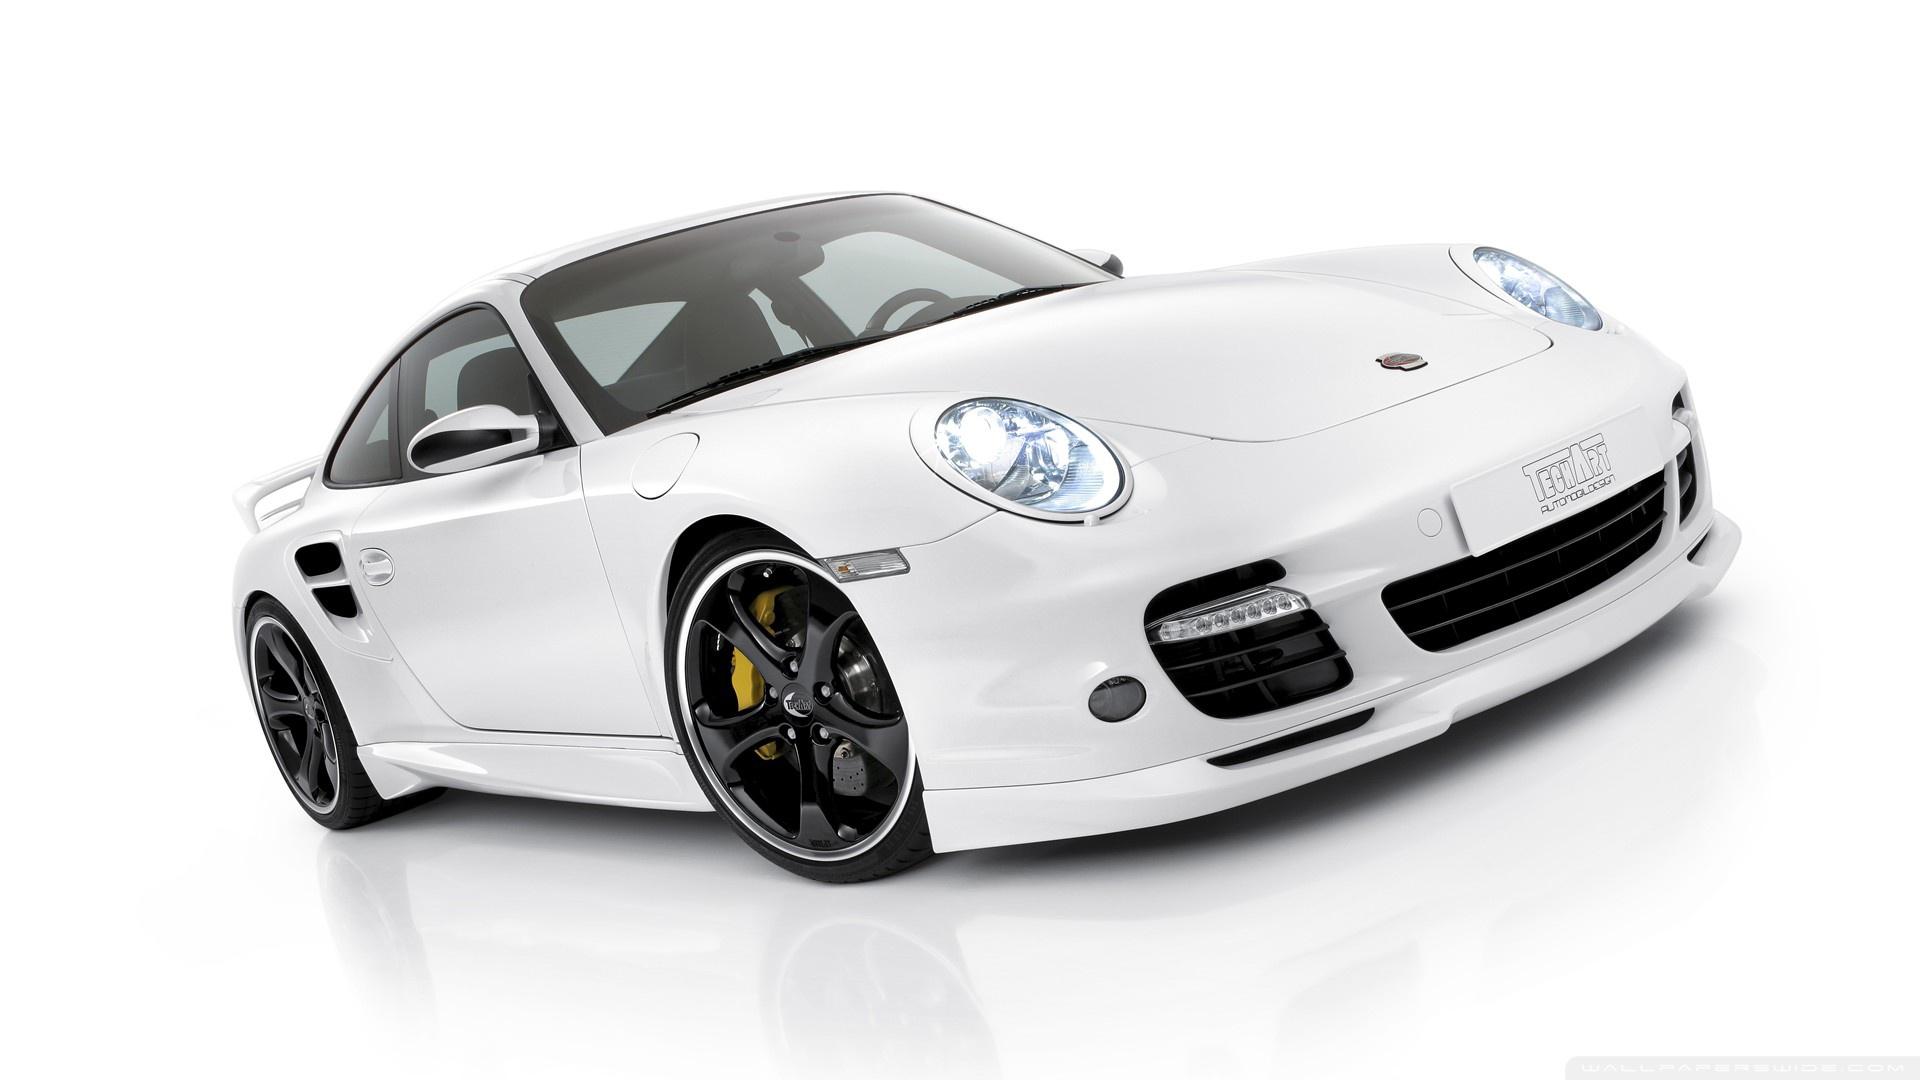 White Porsche Pictures